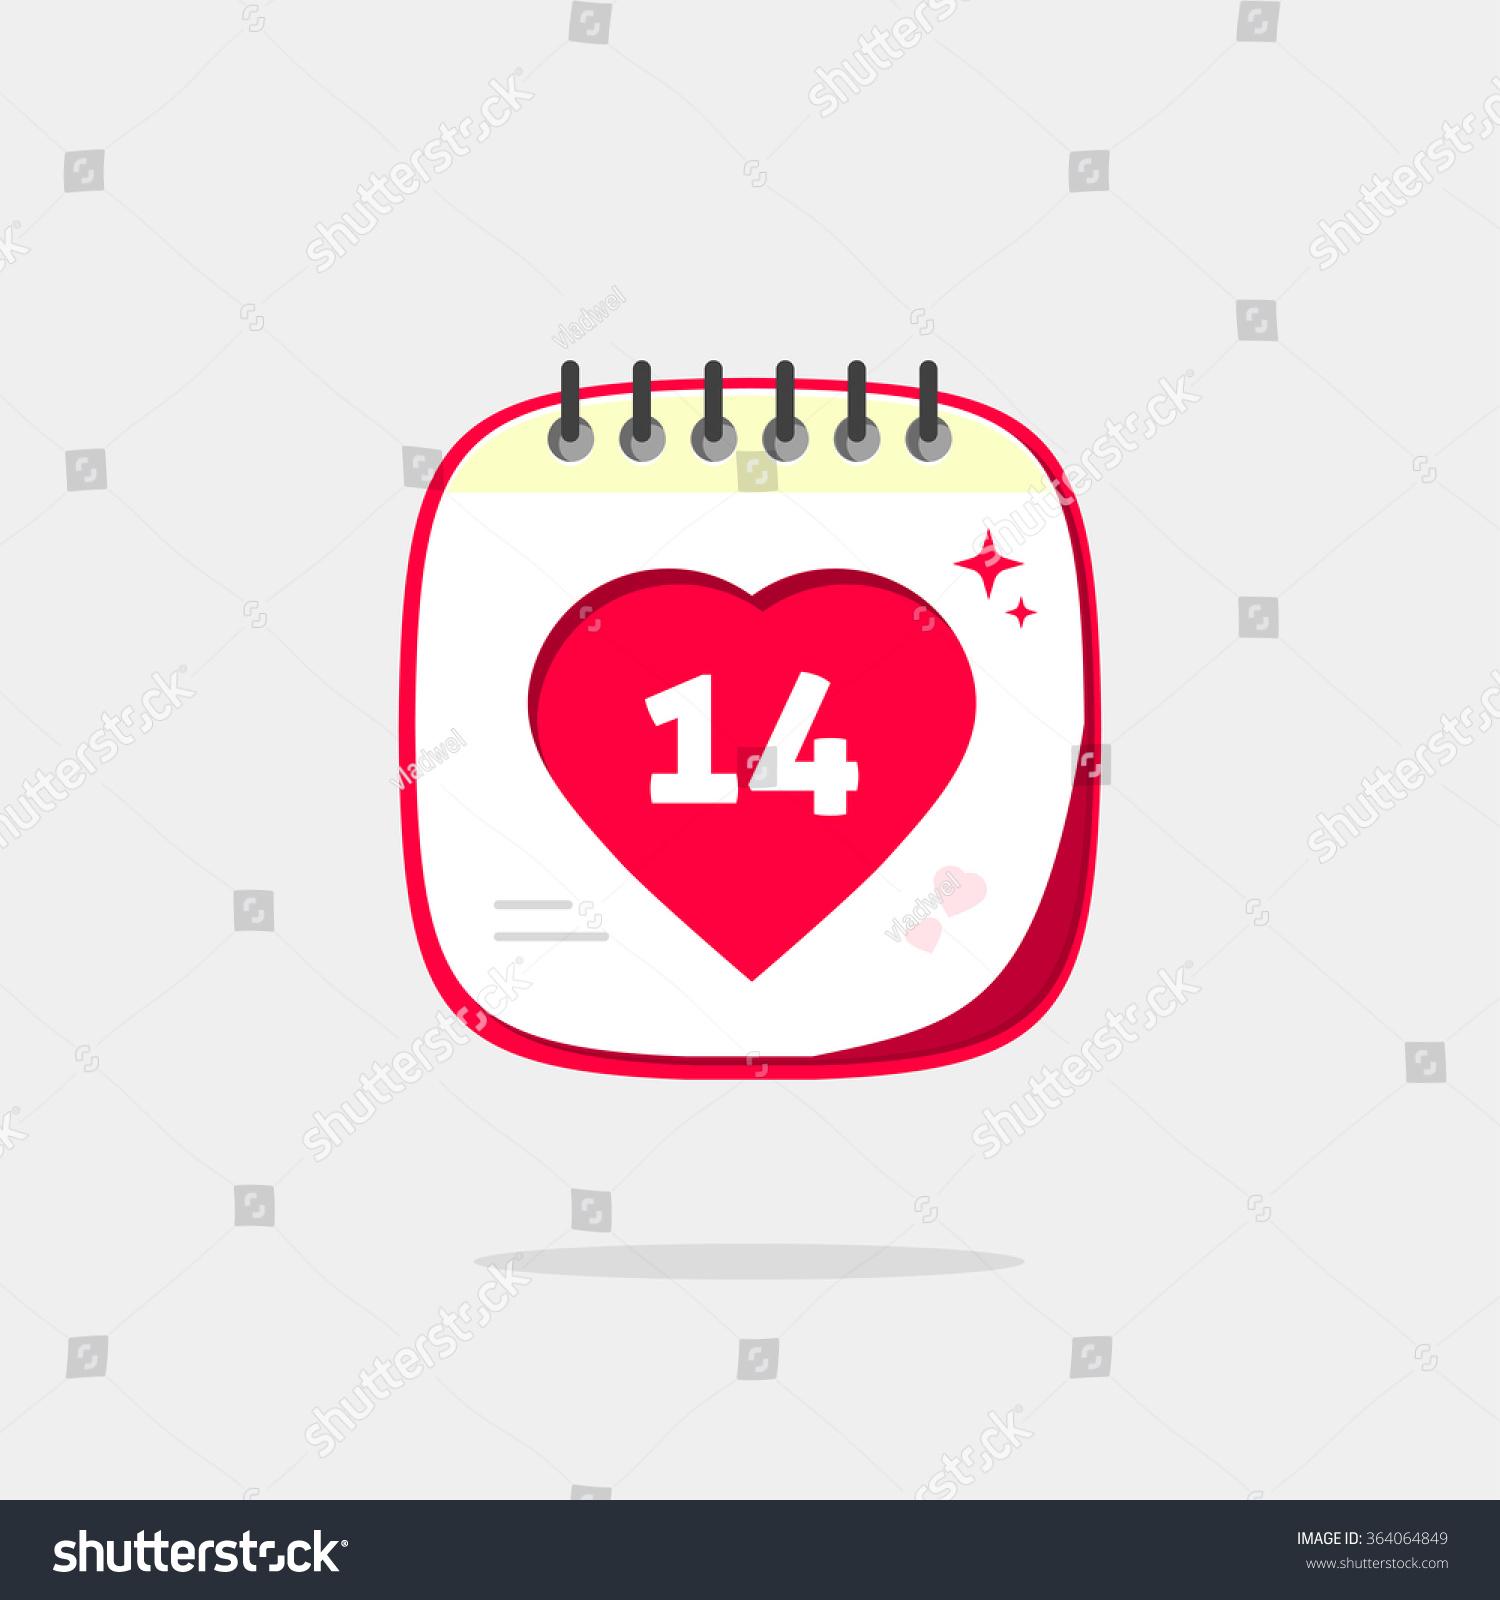 calendar love heart icon valentines day stock illustration